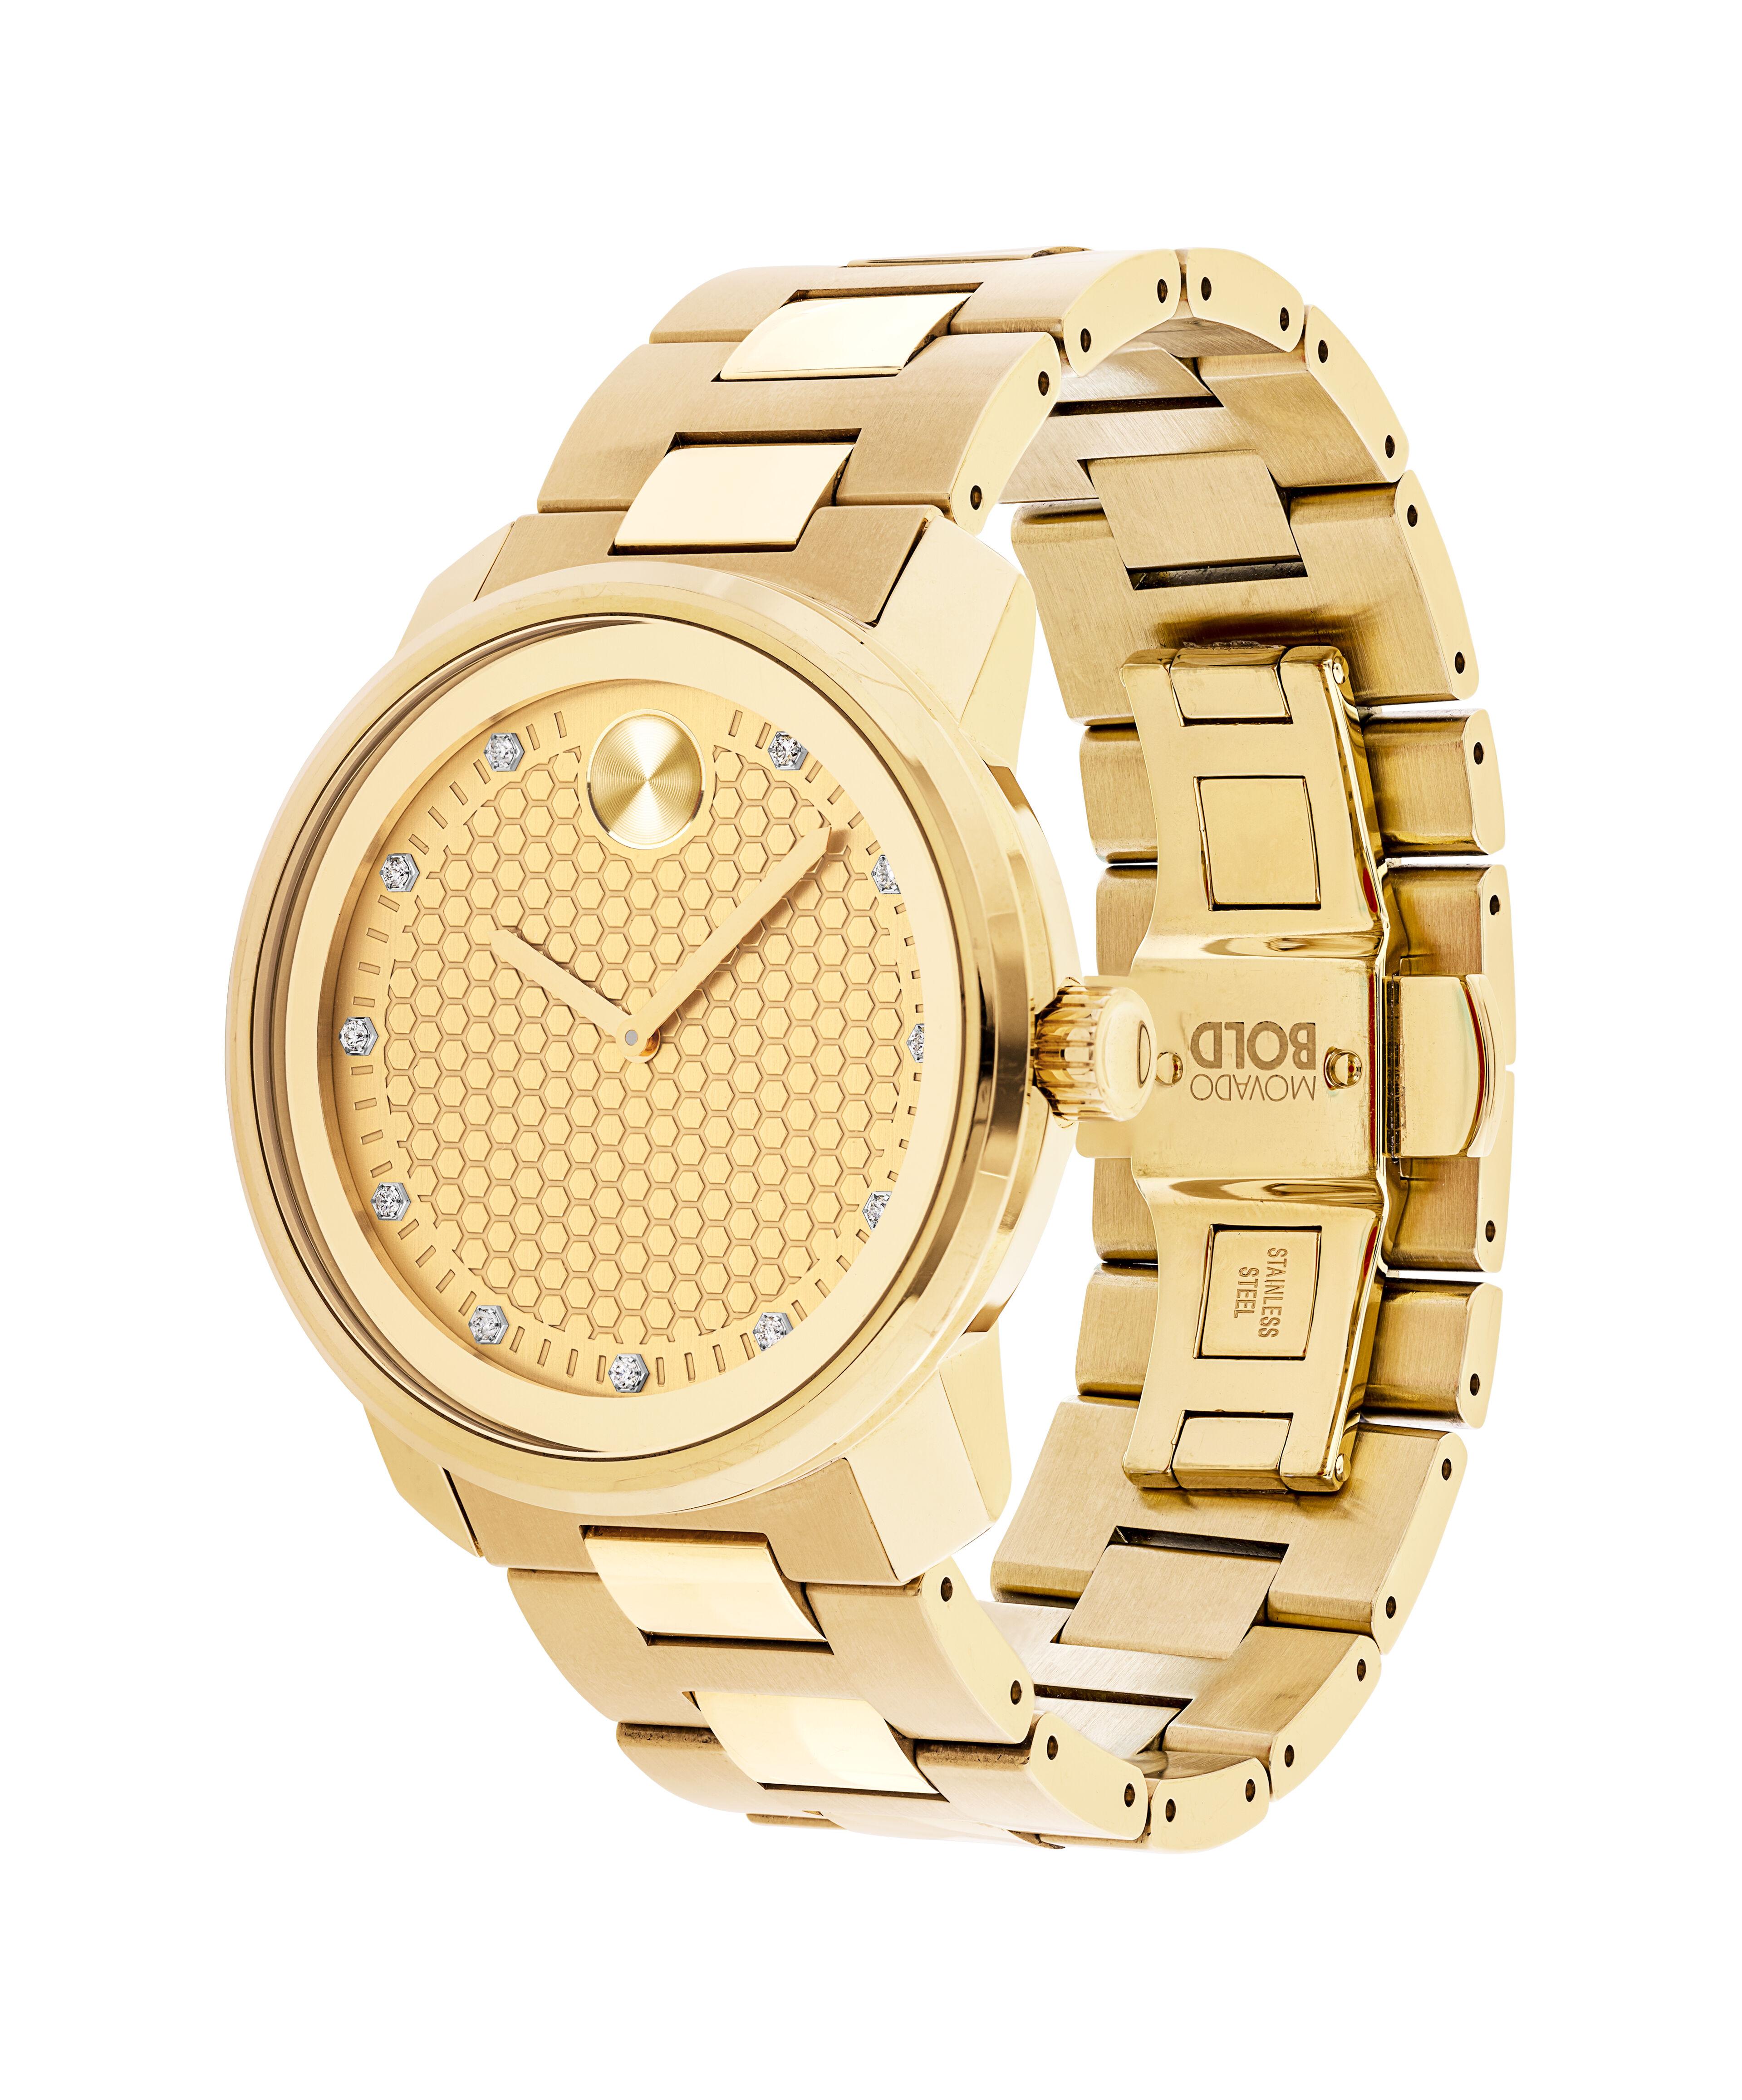 Women's Replica Swiss Watches